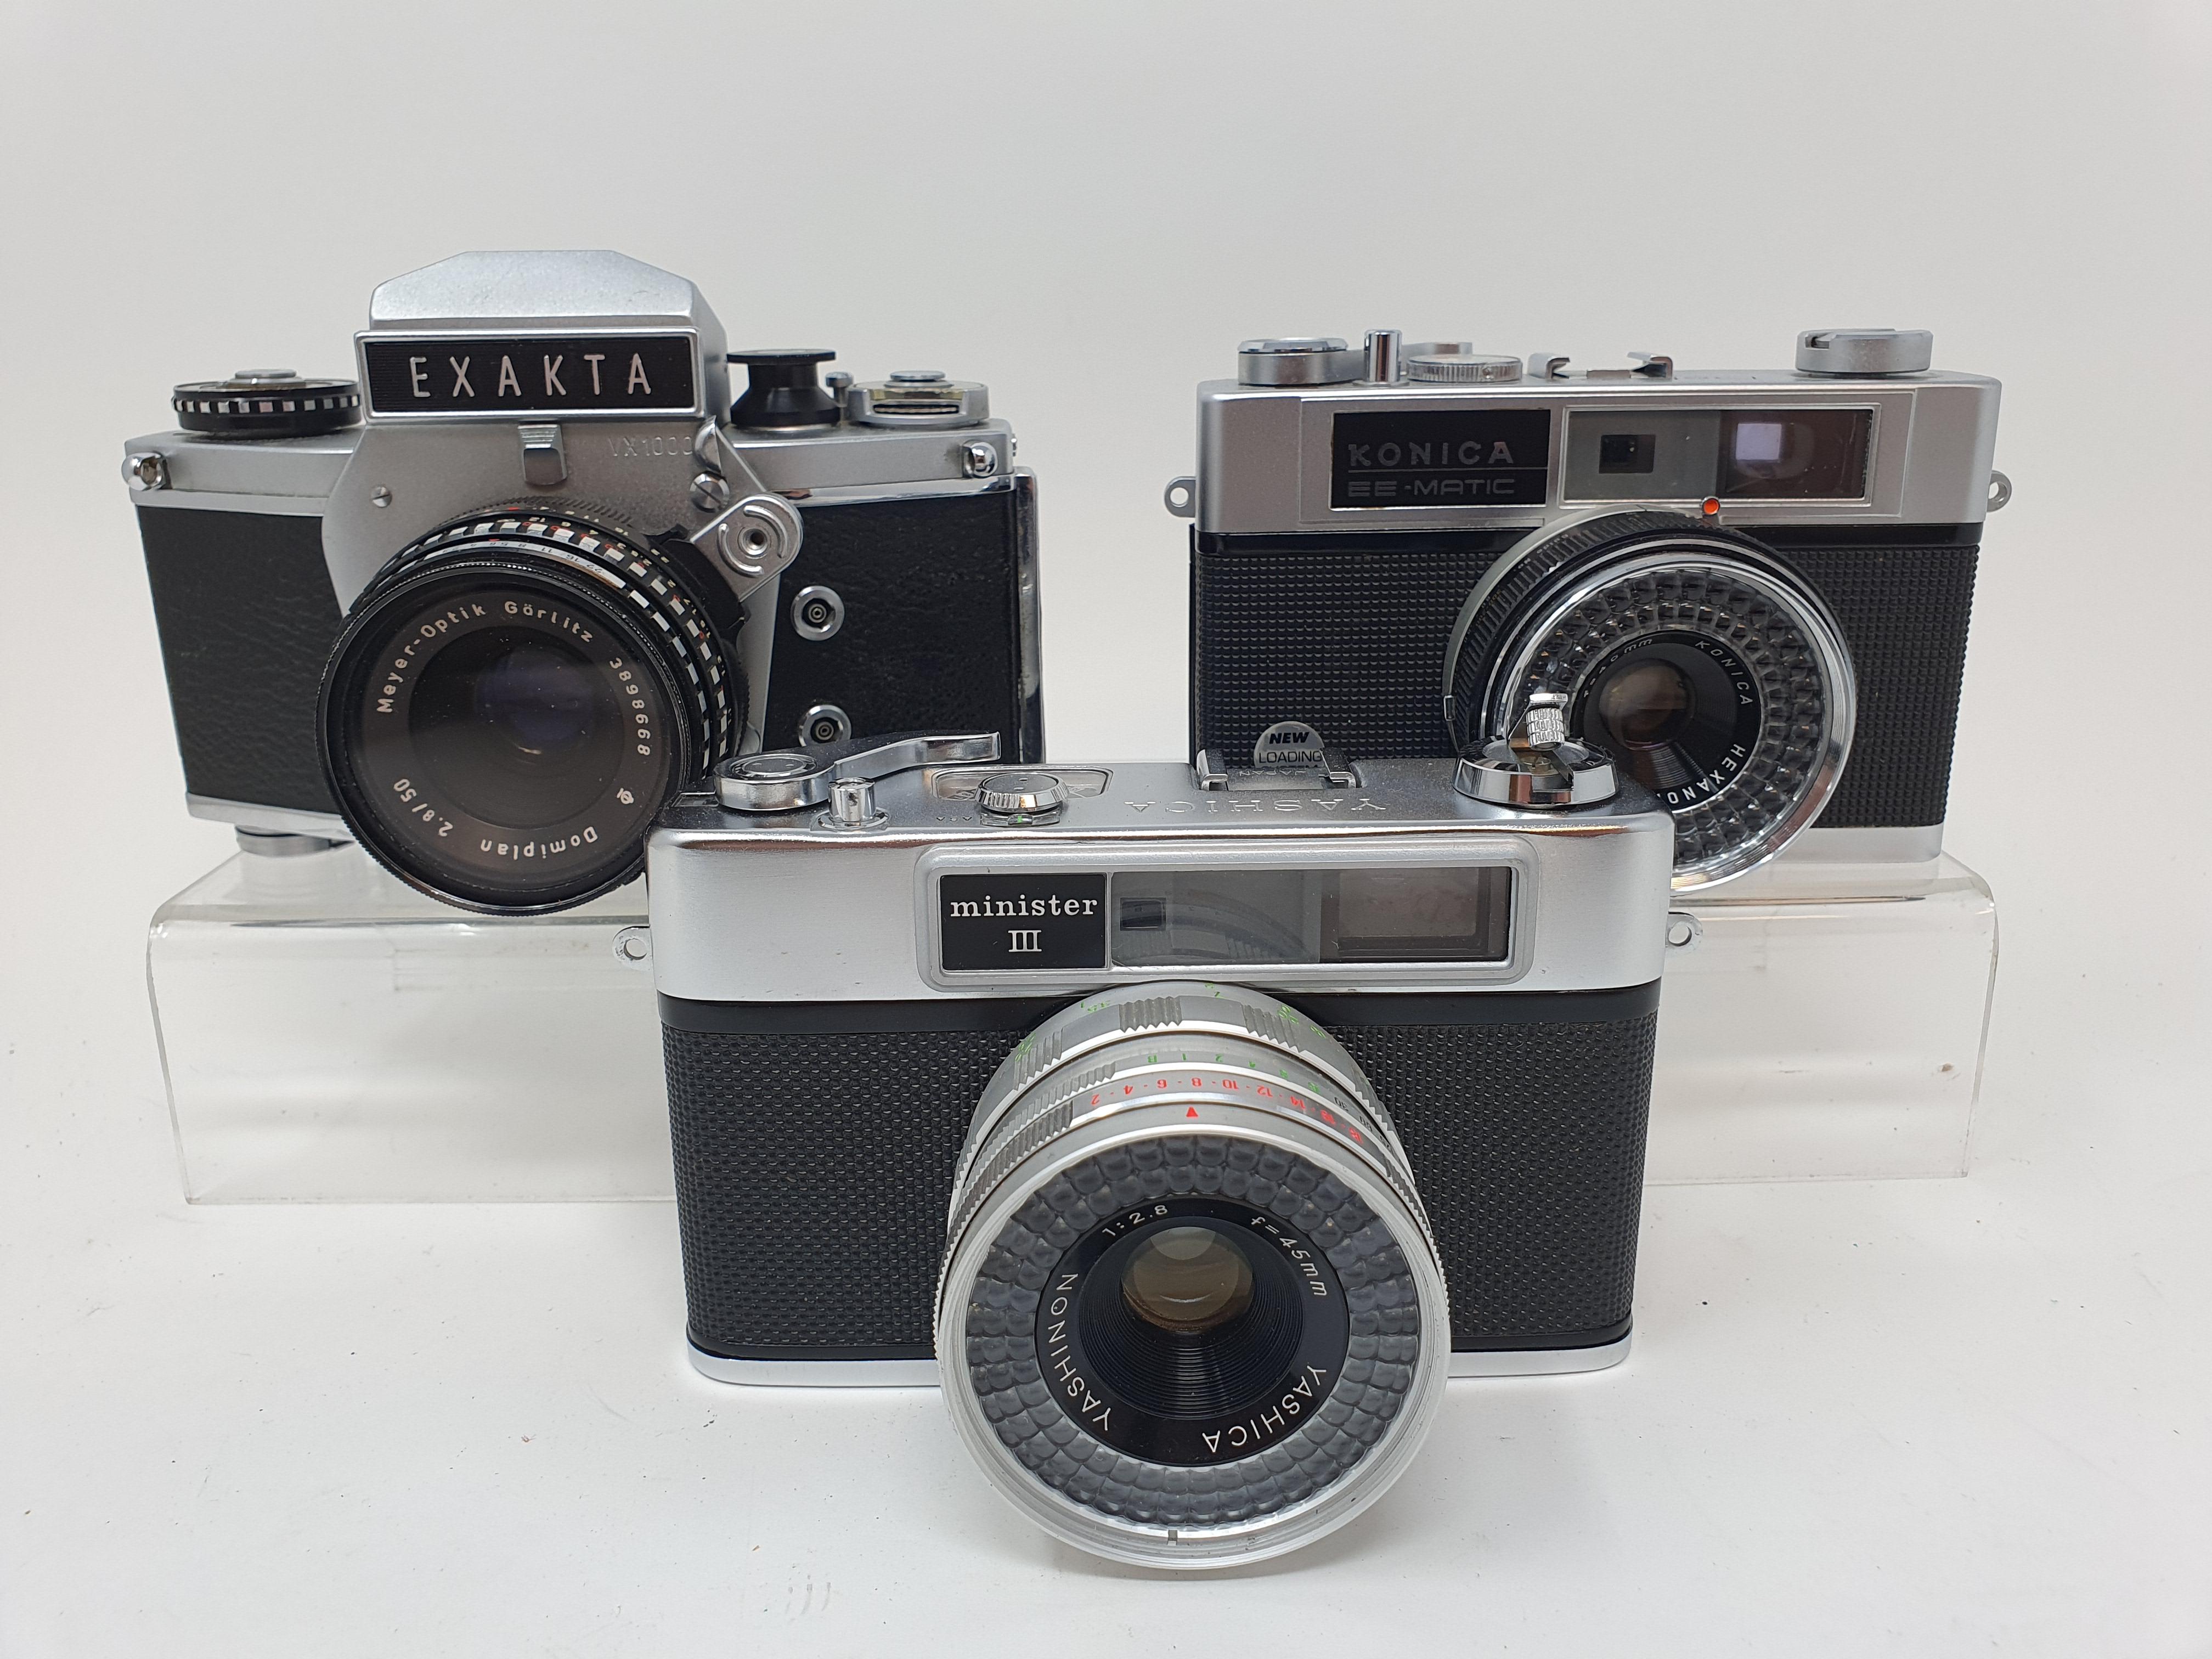 An Exakta VX 1000 camera, a Konica EE-Matic camera and a Yashica Minster III camera (3)